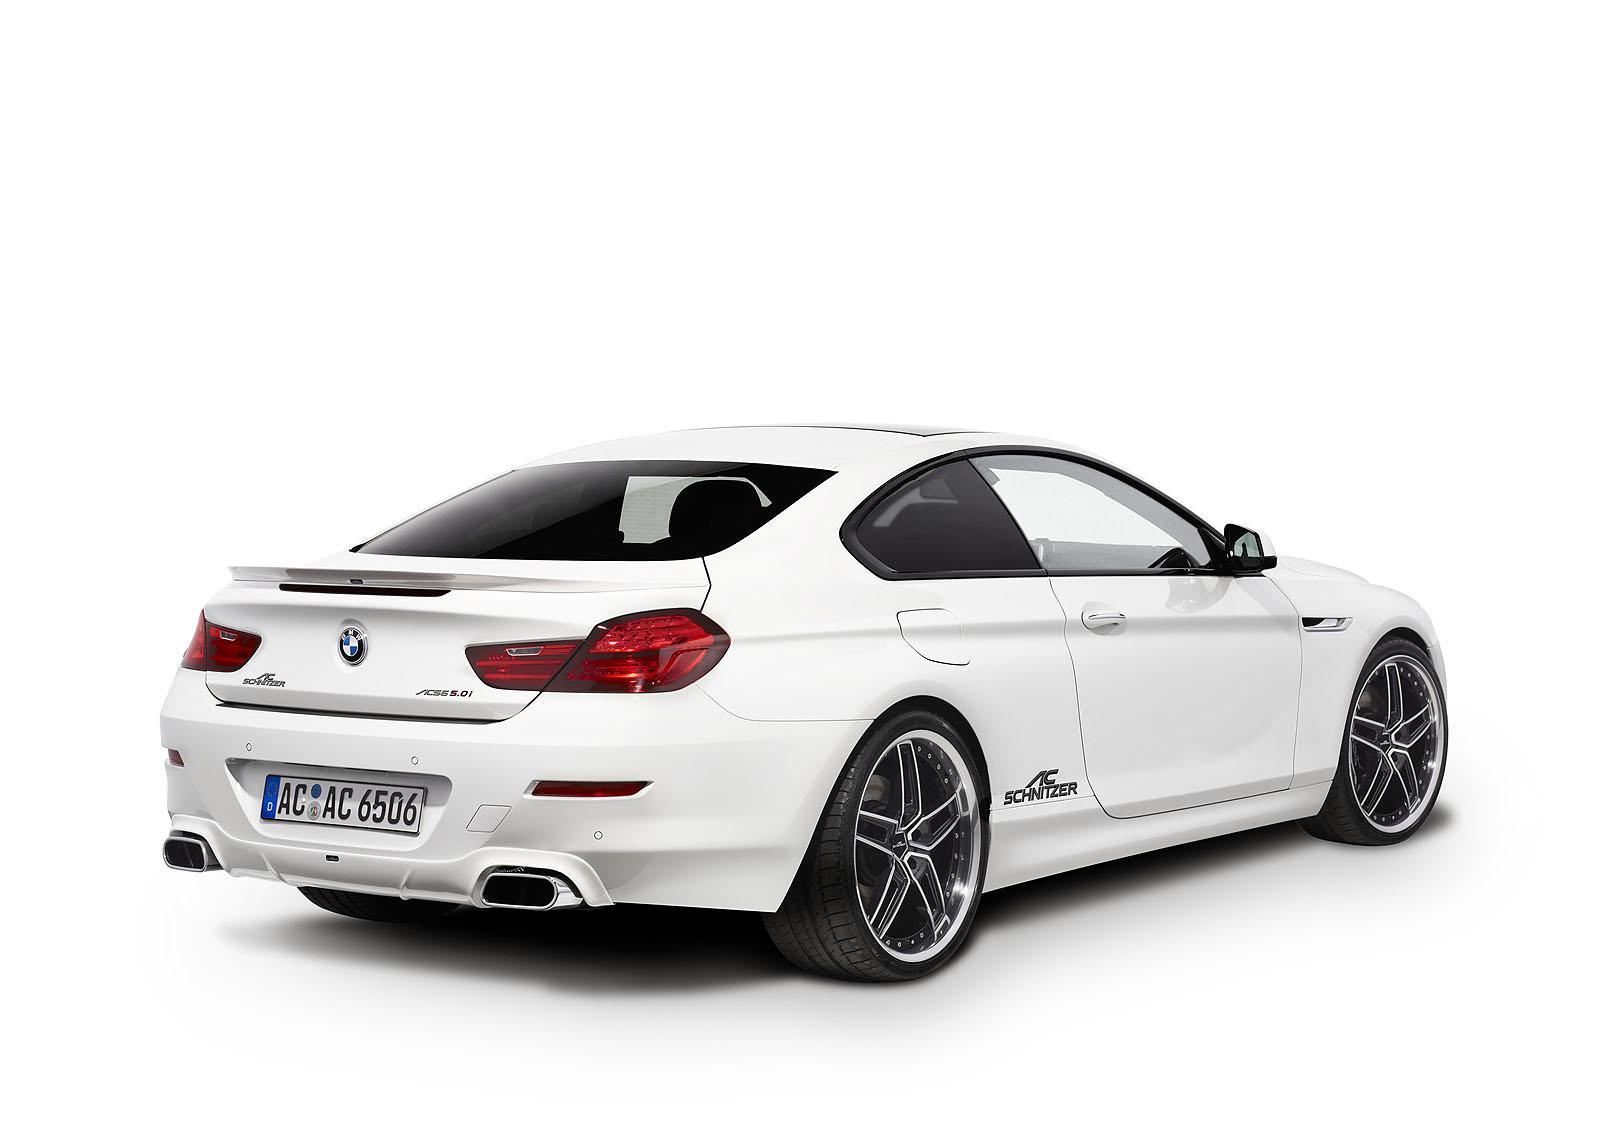 AC Schnitzer BMW 6-Series Coupe F12 [видео] - фотография №5